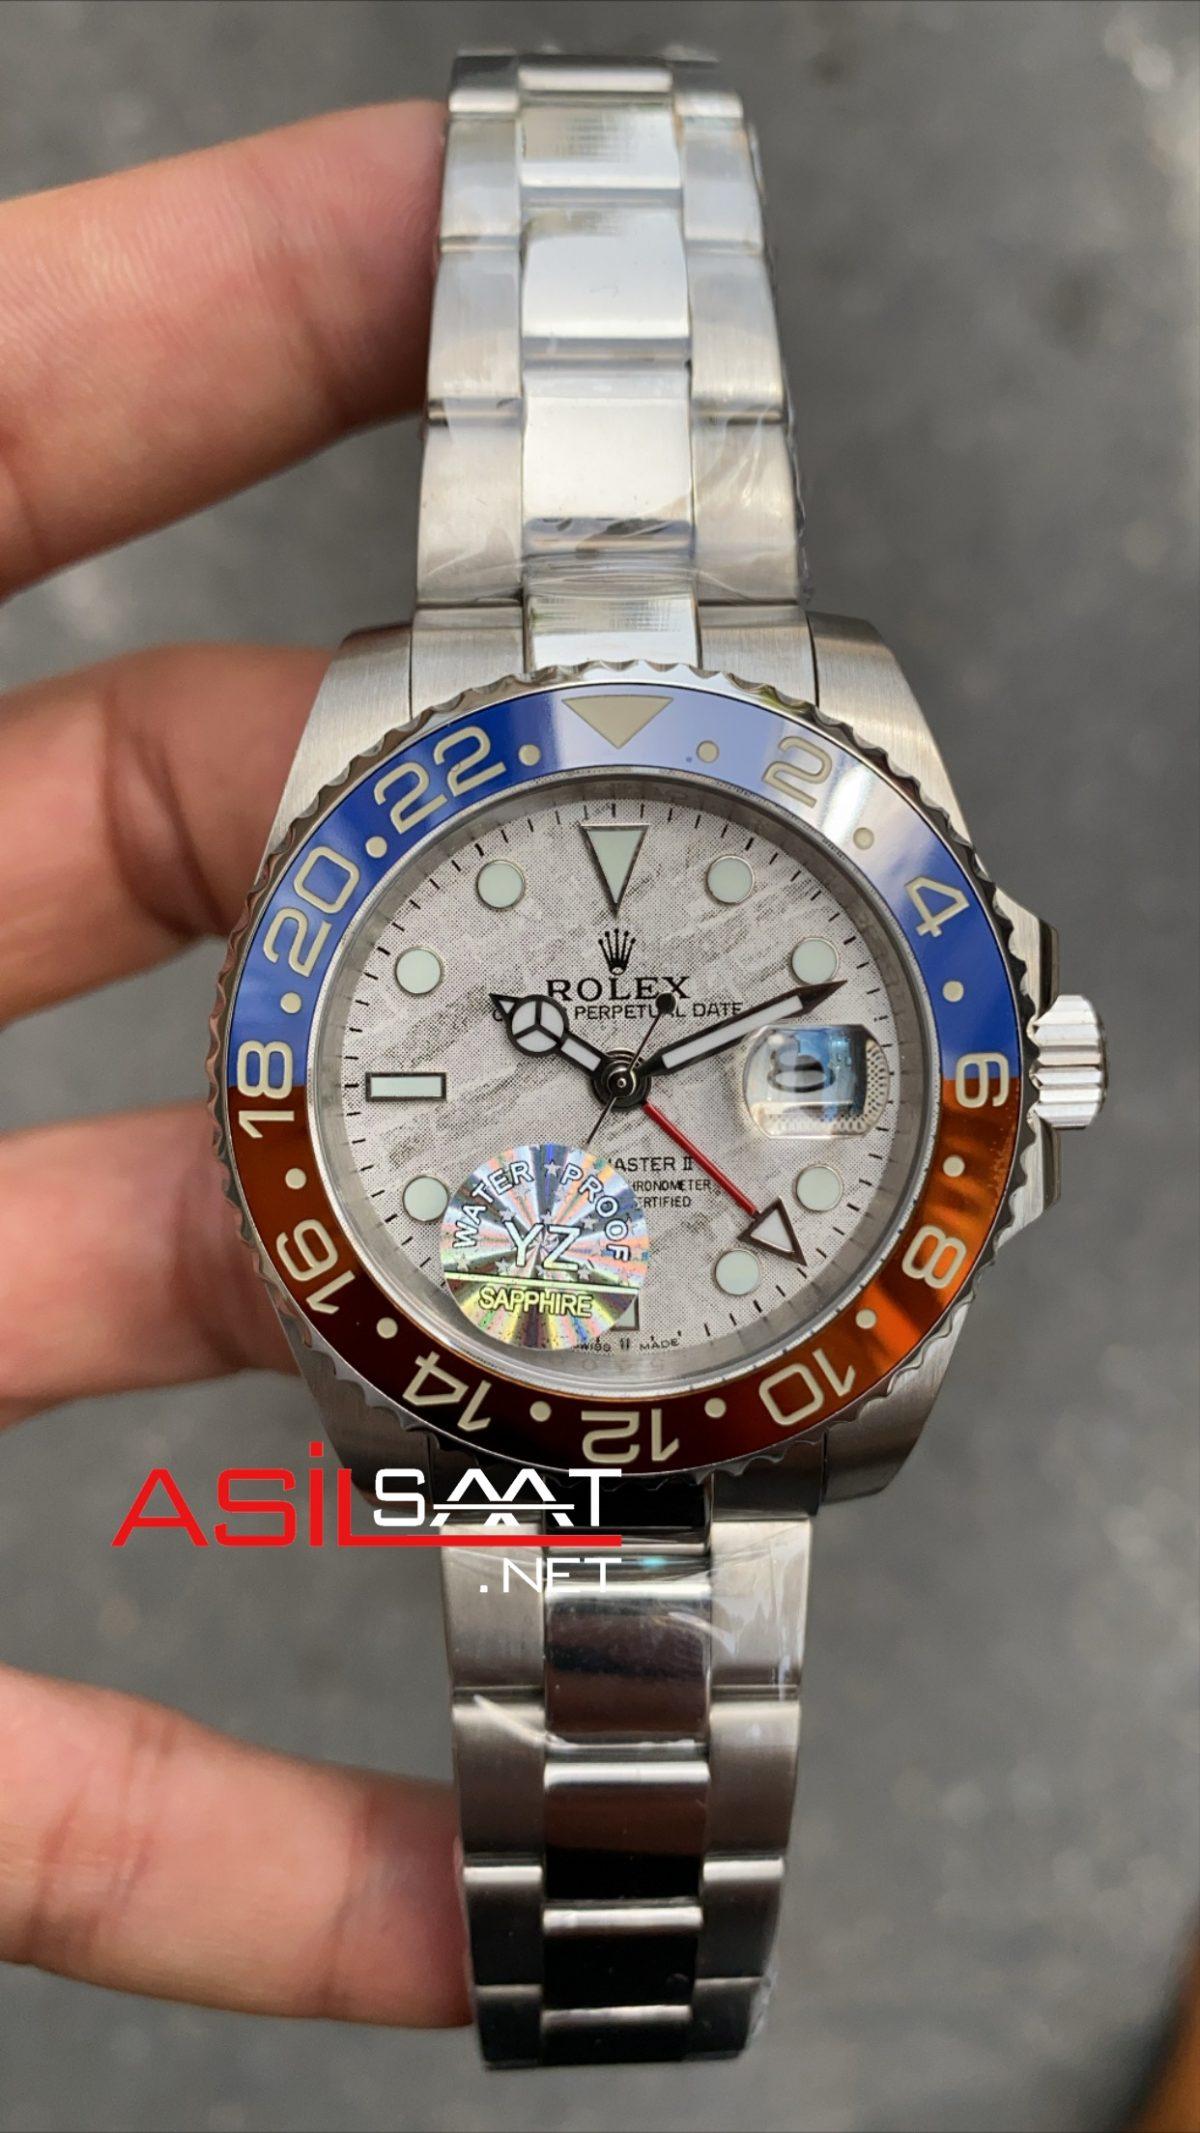 Rolex Oyster Perpetual Gmt Master II Meteor Silver Replika Saat ROLG012